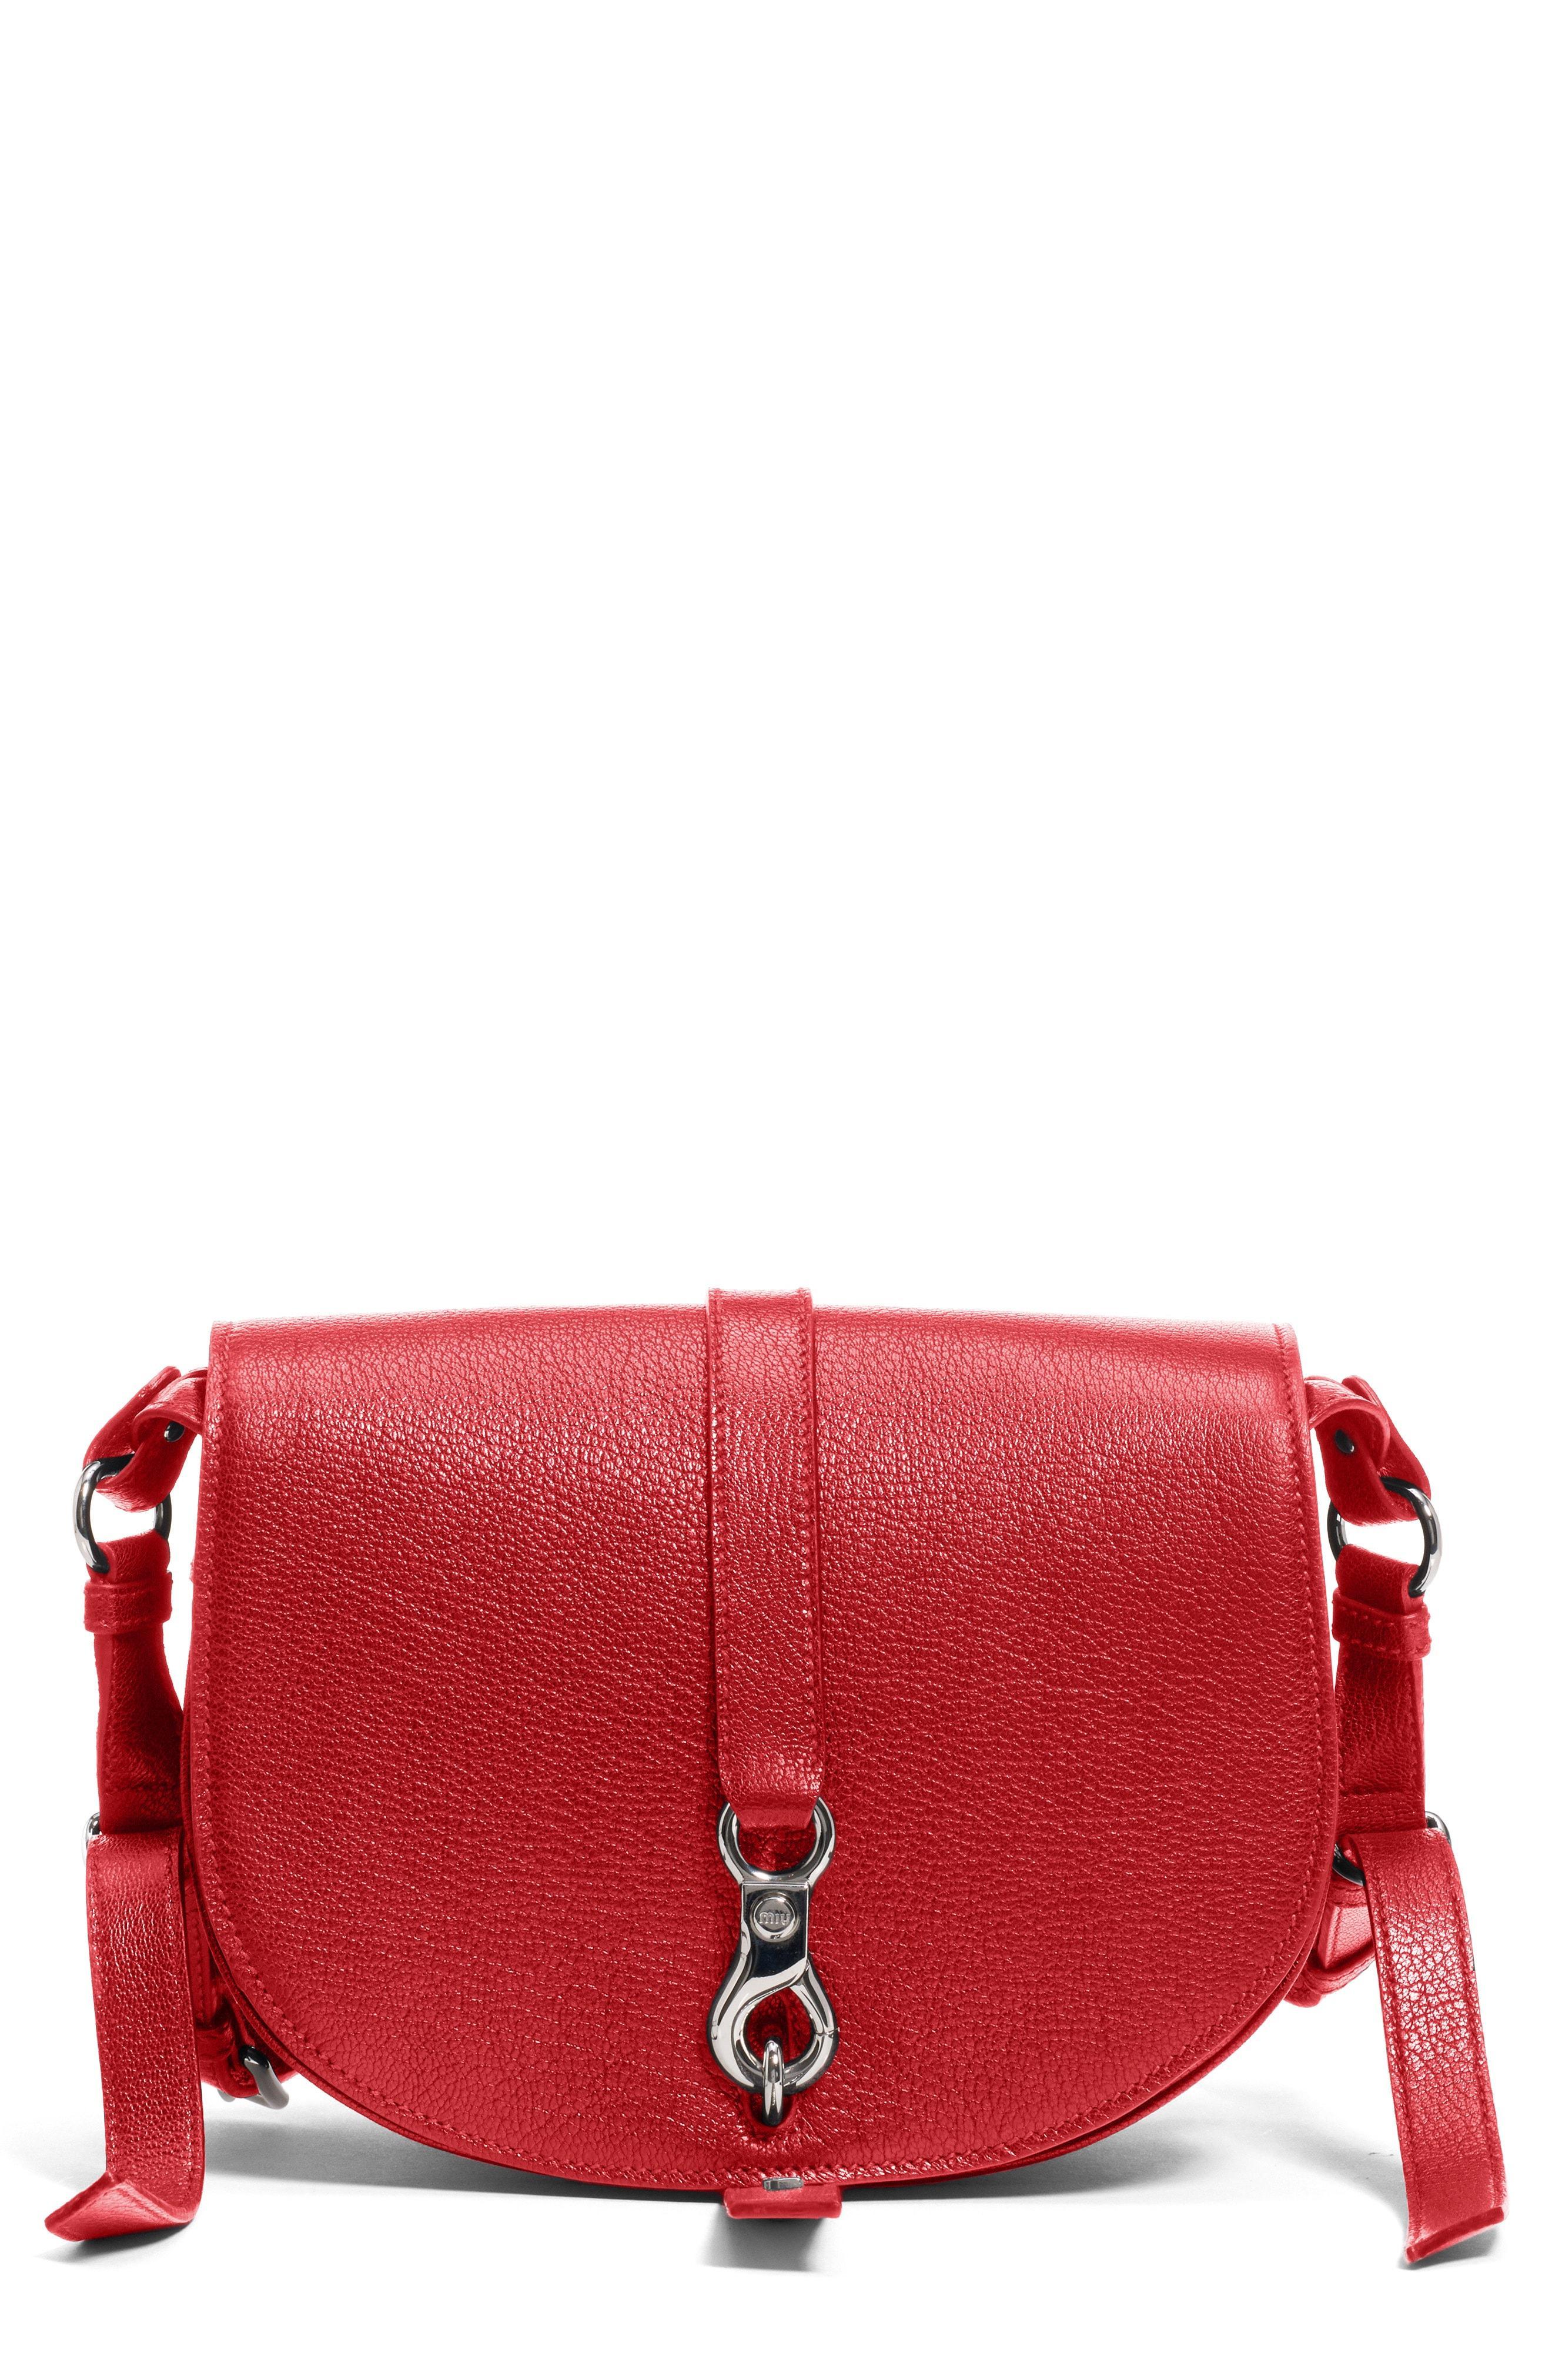 4204be3f35e Lyst - Miu Miu Madras Hunting Leather Crossbody Bag in Red